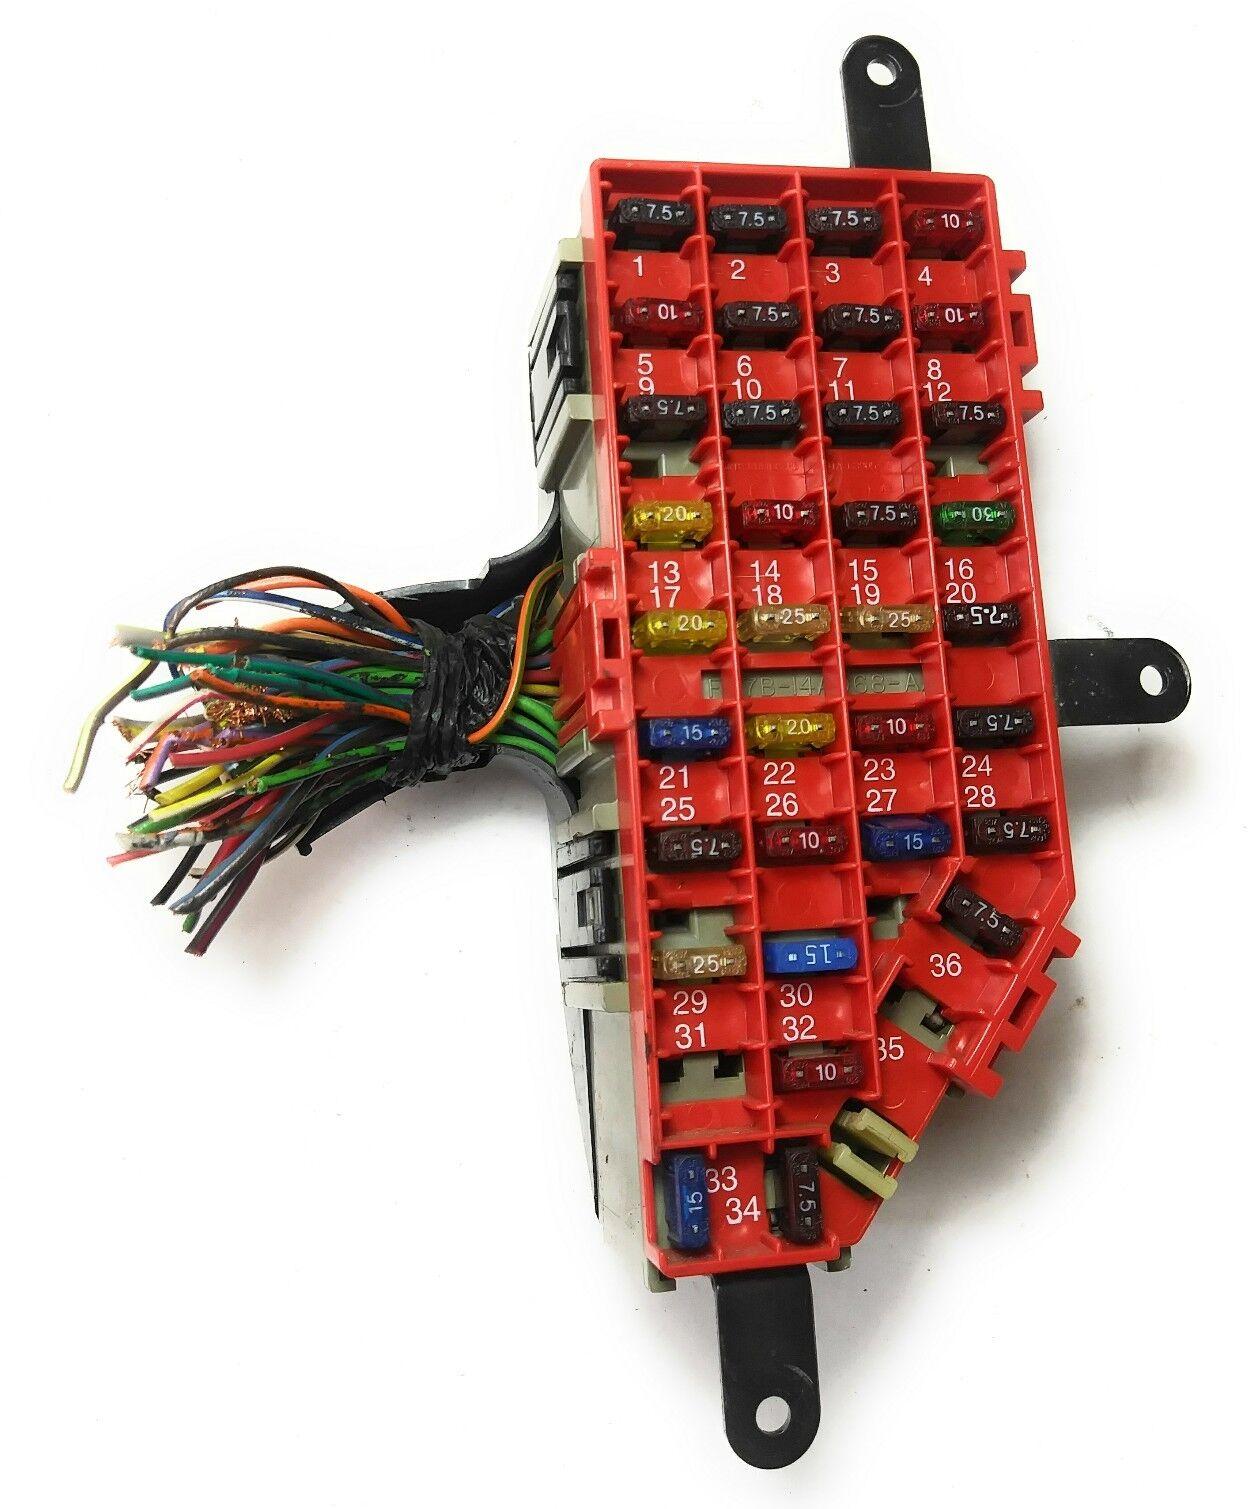 tl1000s wiring diagram fde549f suzuki tl1000s fuse box wiring resources  fde549f suzuki tl1000s fuse box